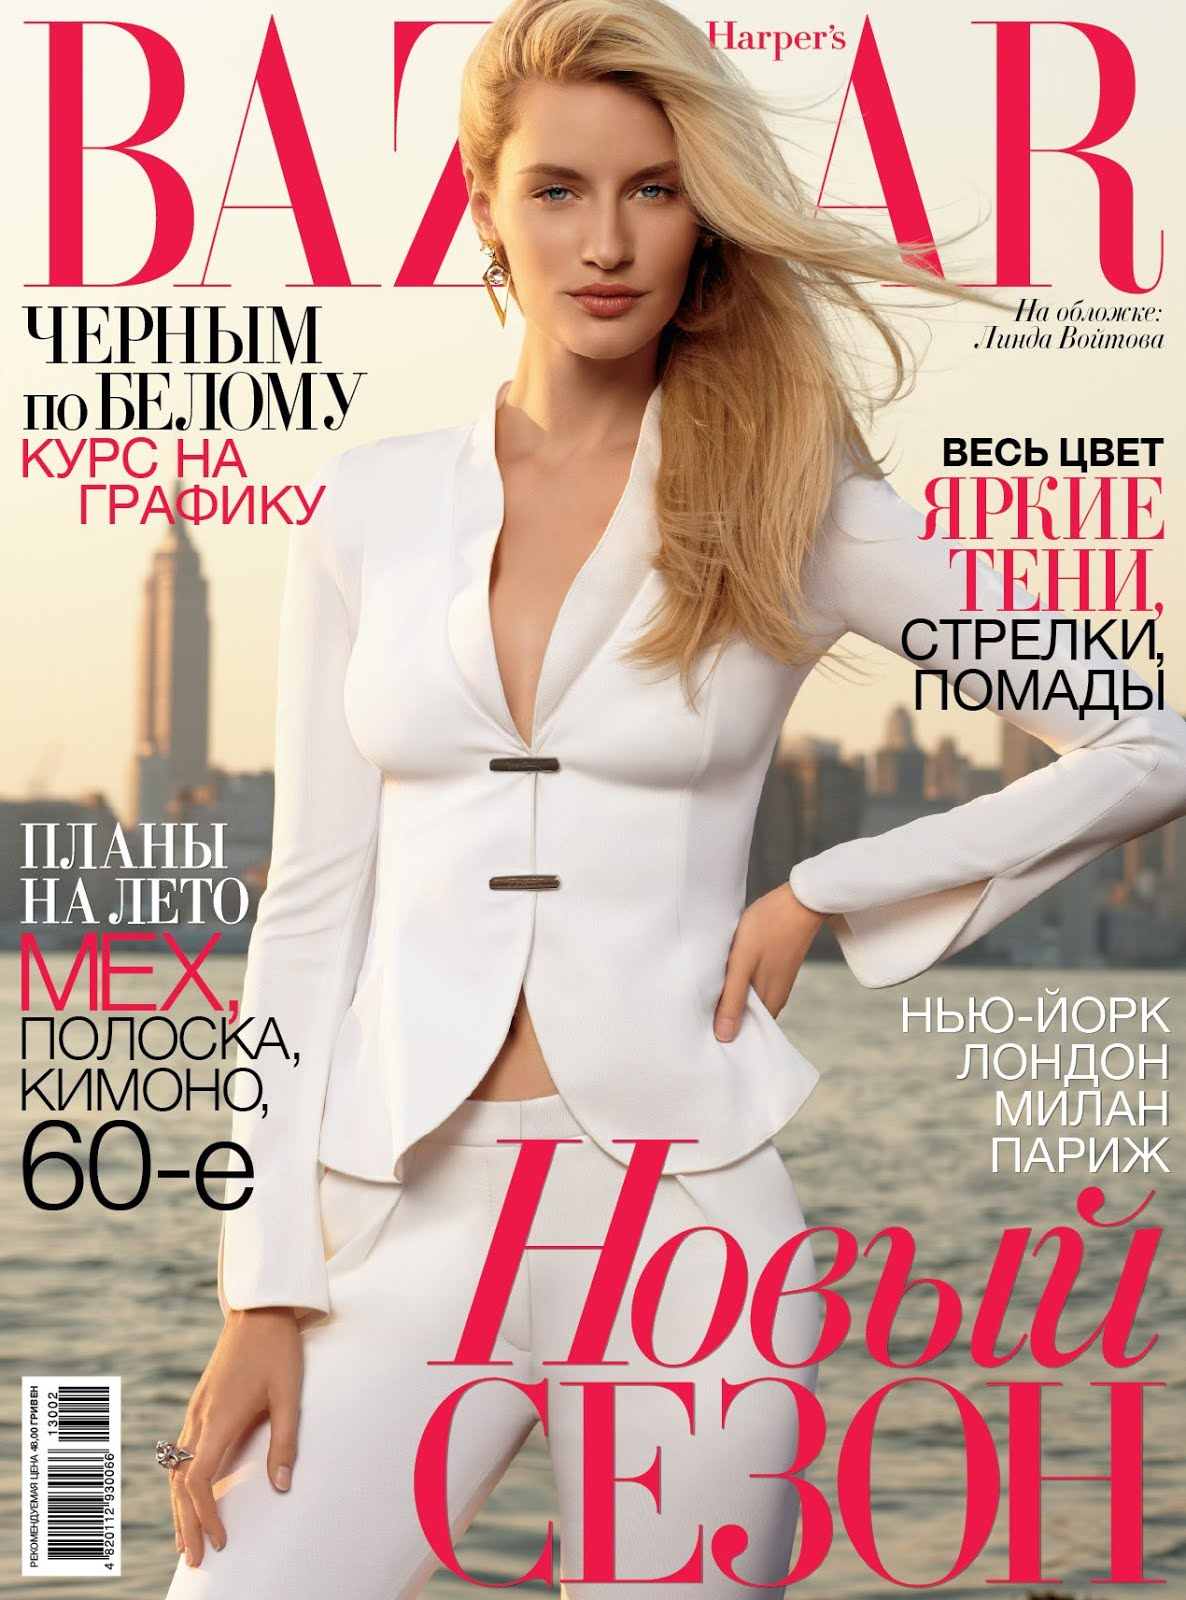 http://4.bp.blogspot.com/-mXWHjJQuTnc/UQAtYT80MkI/AAAAAAAA_IE/hxuc3LtkPdg/s1600/Harpers-Bazaar-Ukraine-January-2013-Linda-Vojtova-Cover.jpg